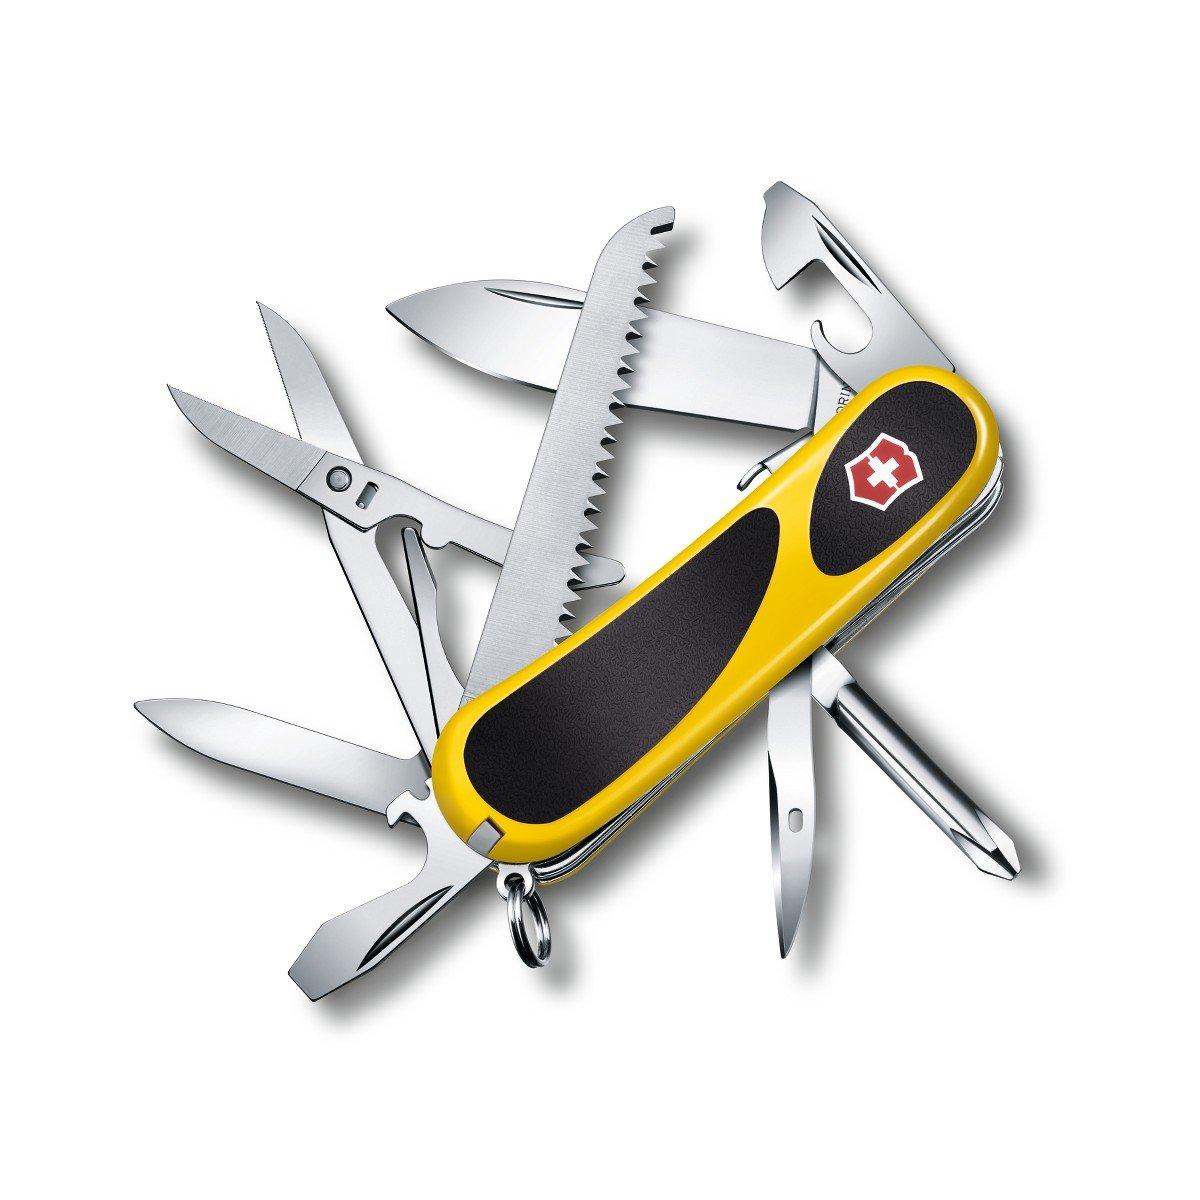 Victorinox Swiss EvoGrip Pocket Knife